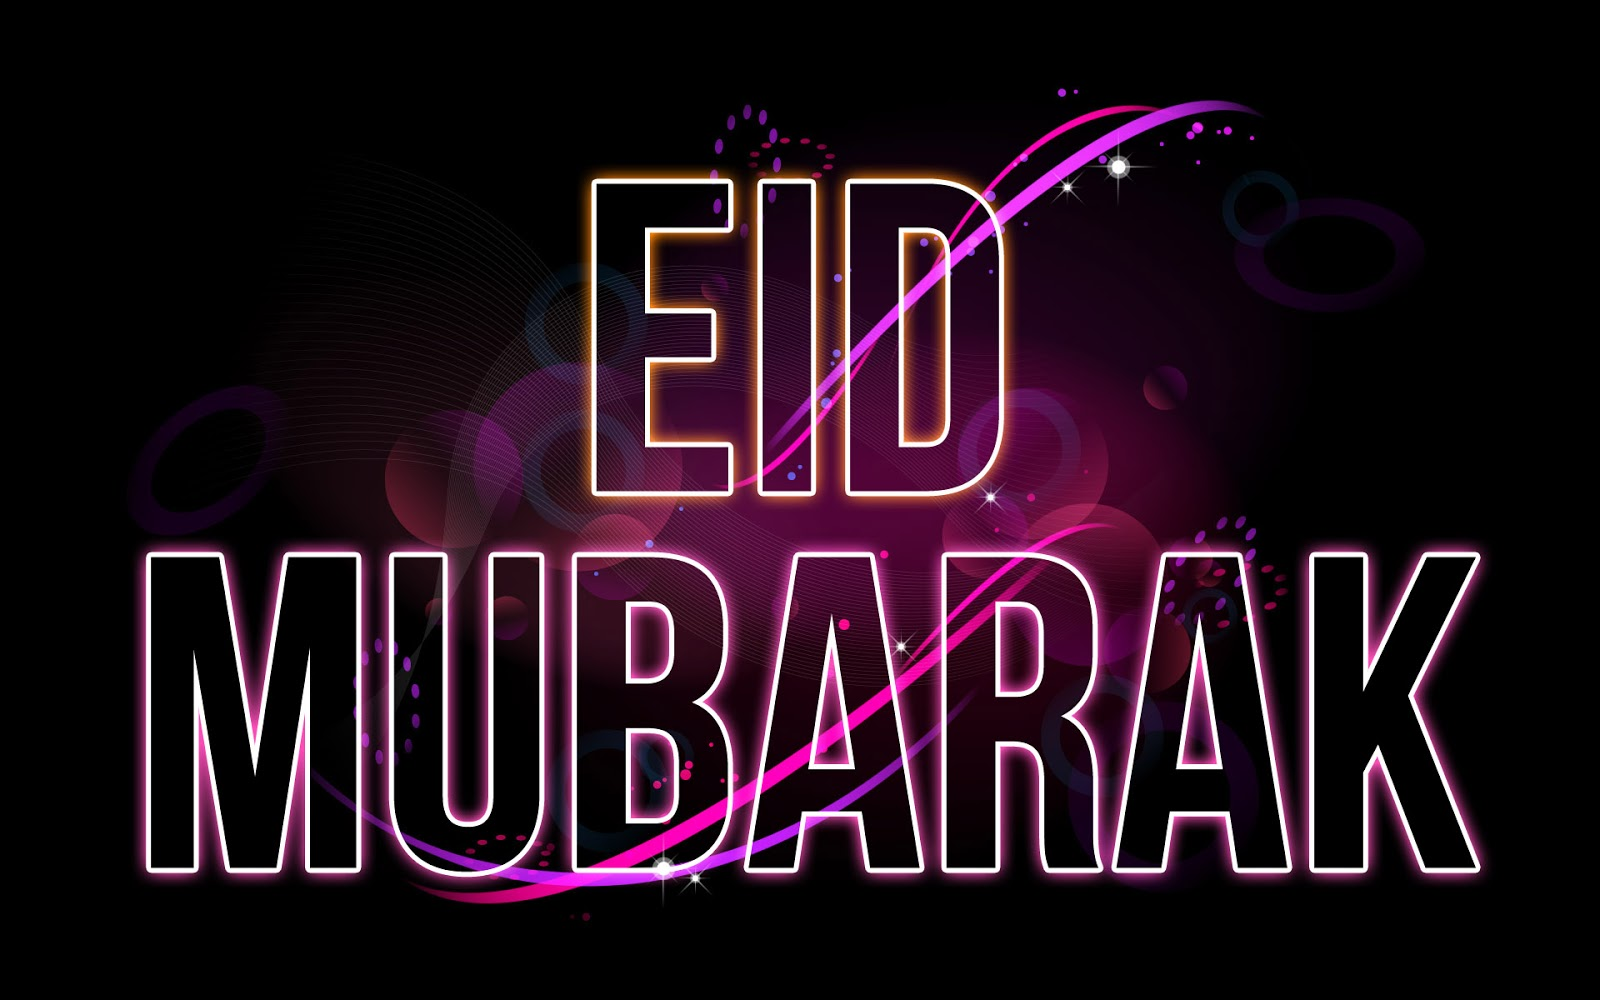 Hd wallpaper eid mubarak - Eid Mubarak 2013 Hd Wallpaperclick To Enlarge Wallpaper